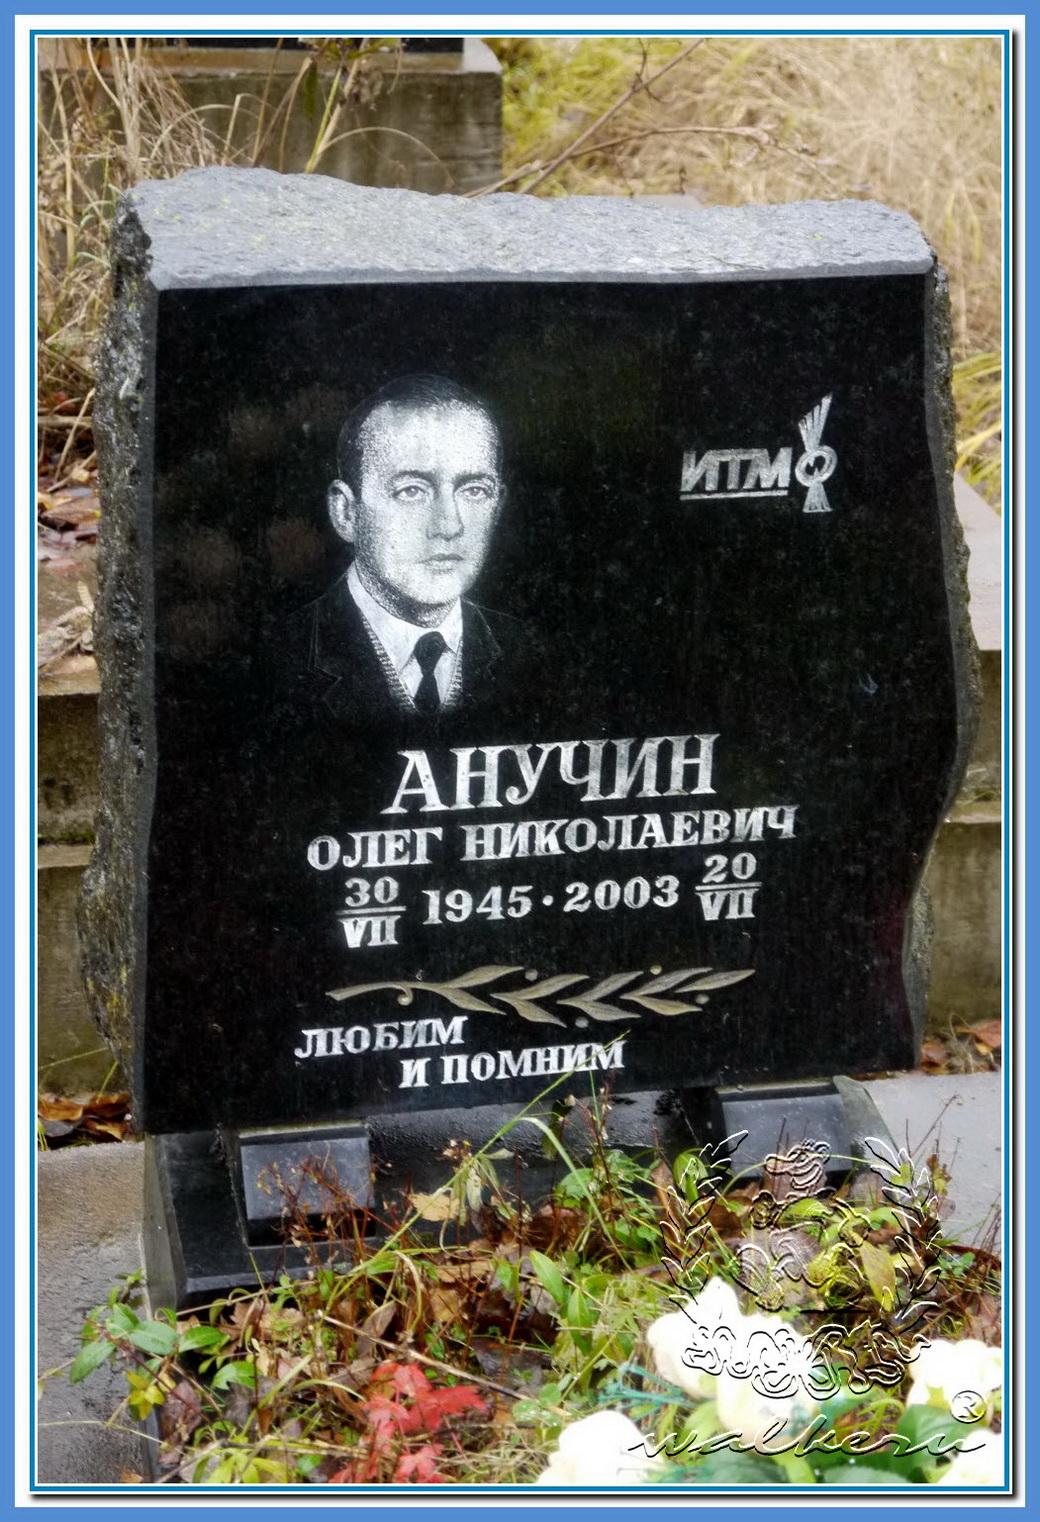 Анучин Олег Николаевич